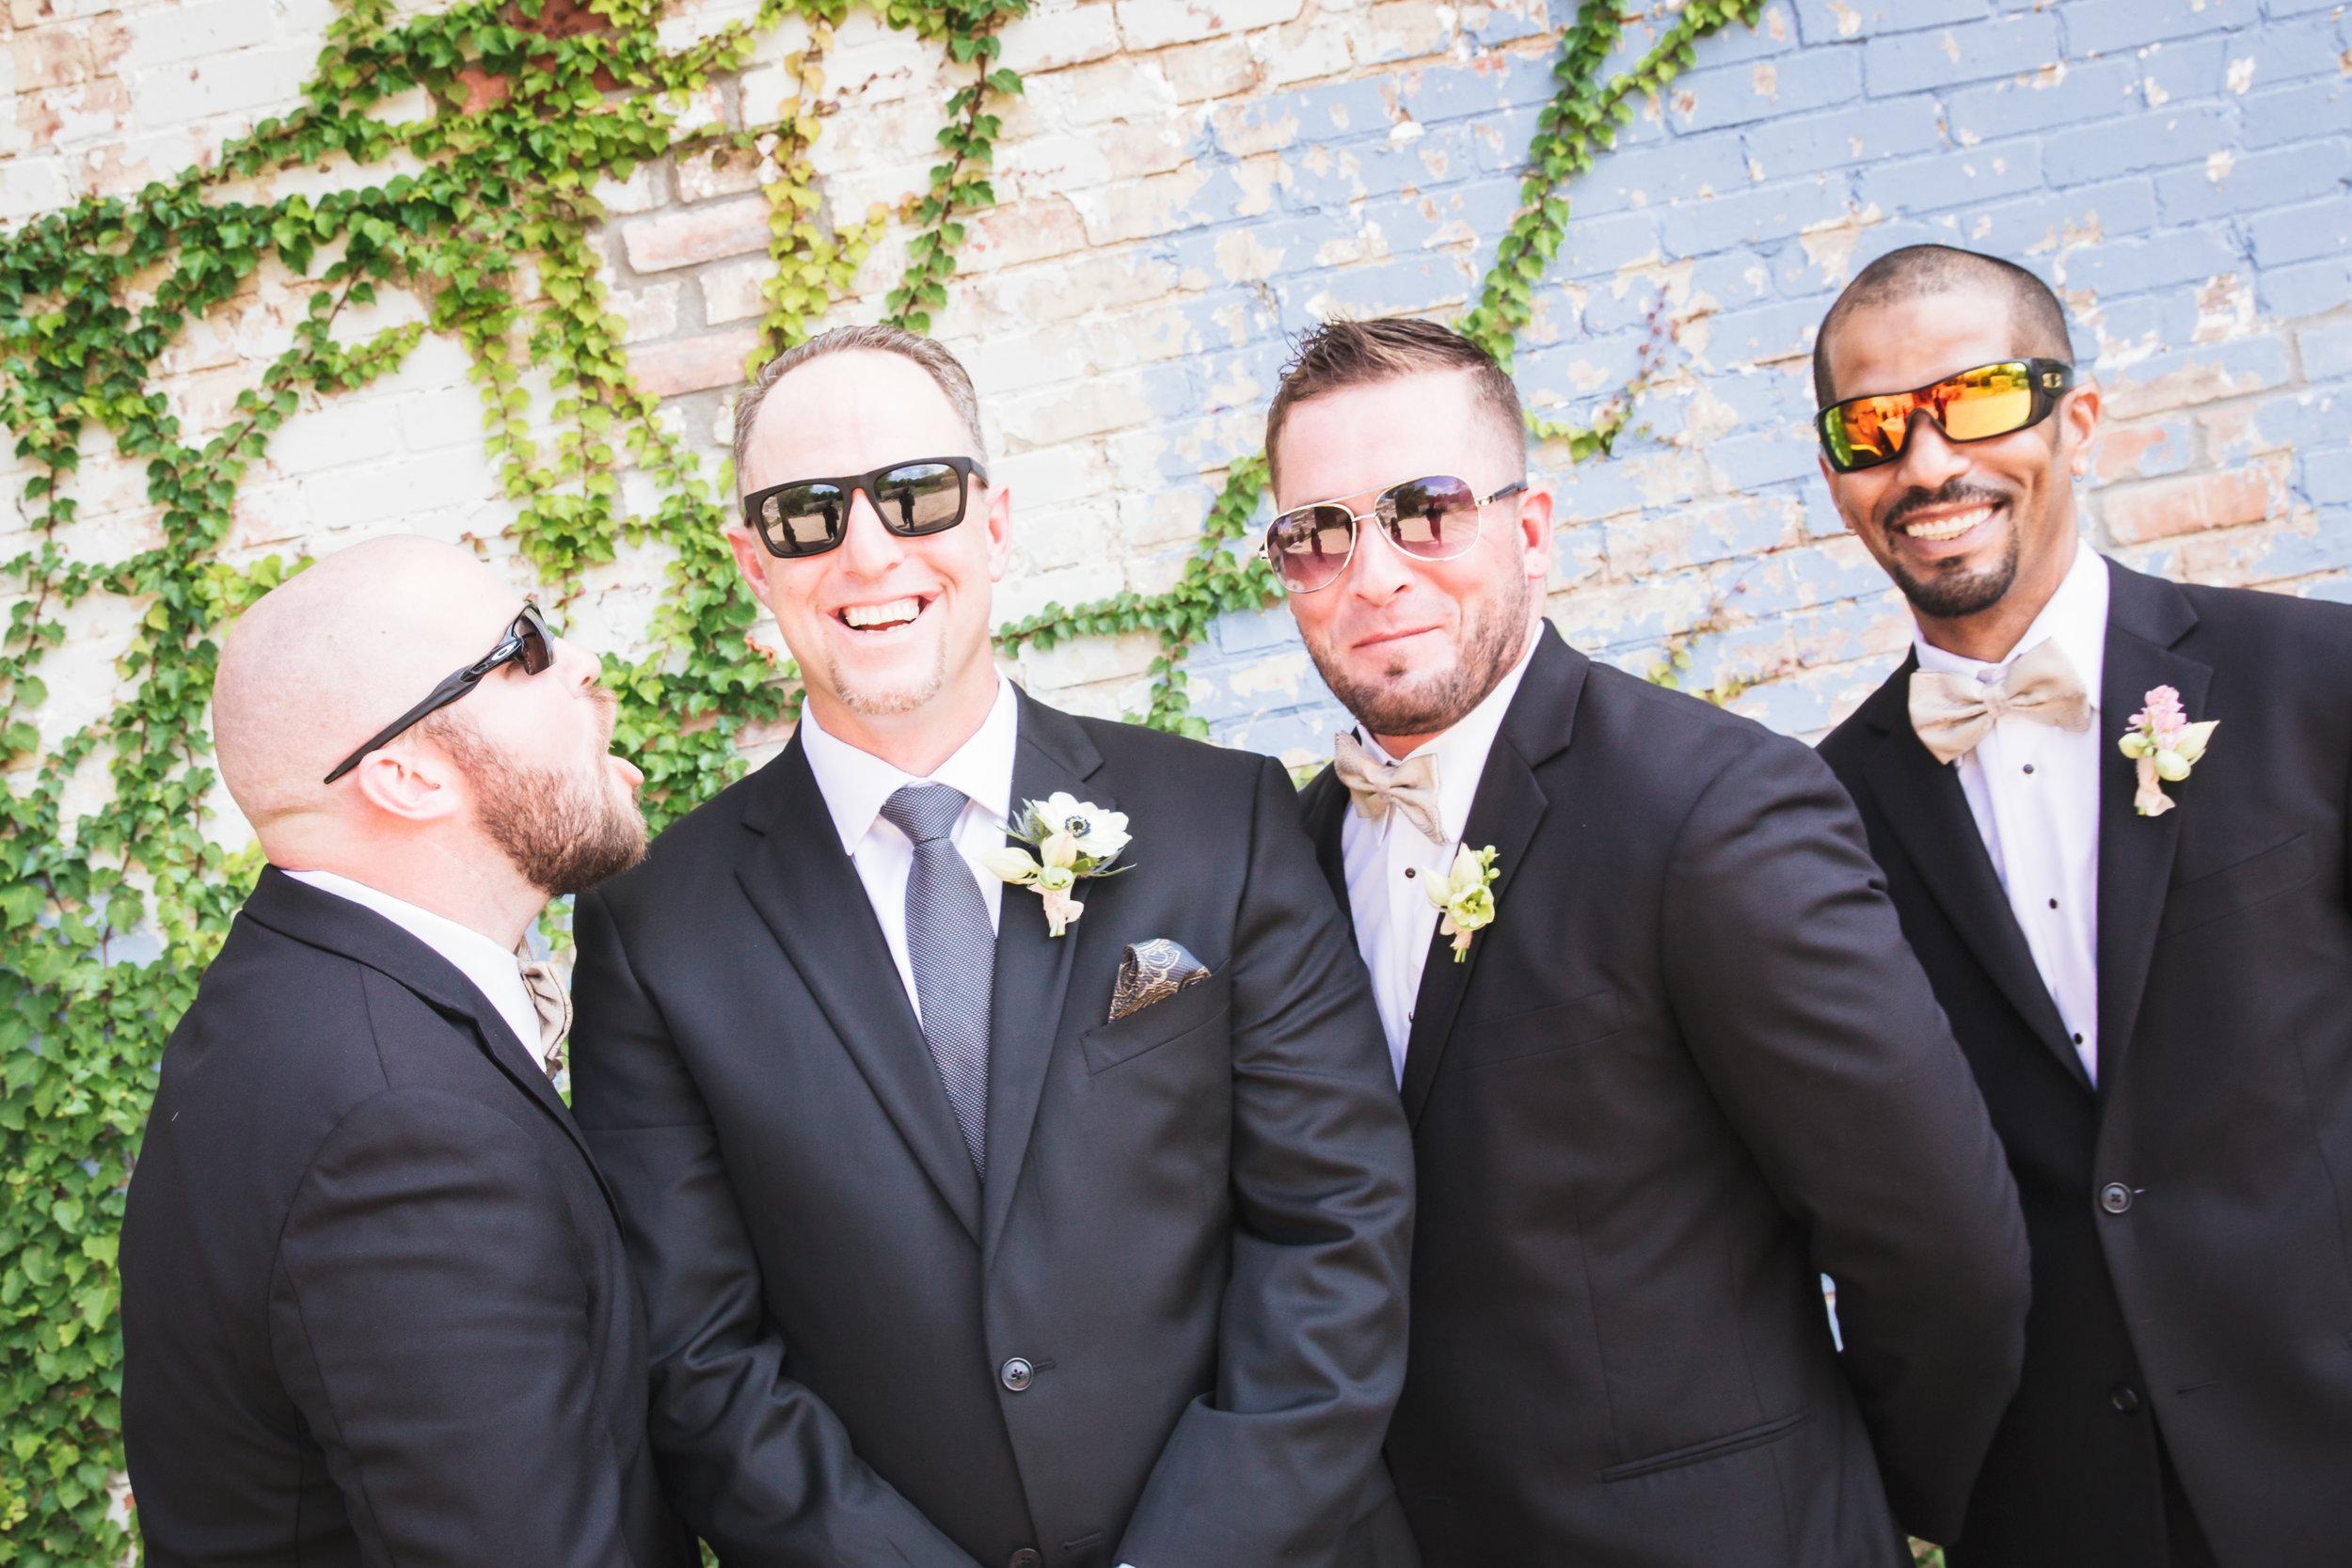 FT_Worth_Wedding_Photgraphy.jpg